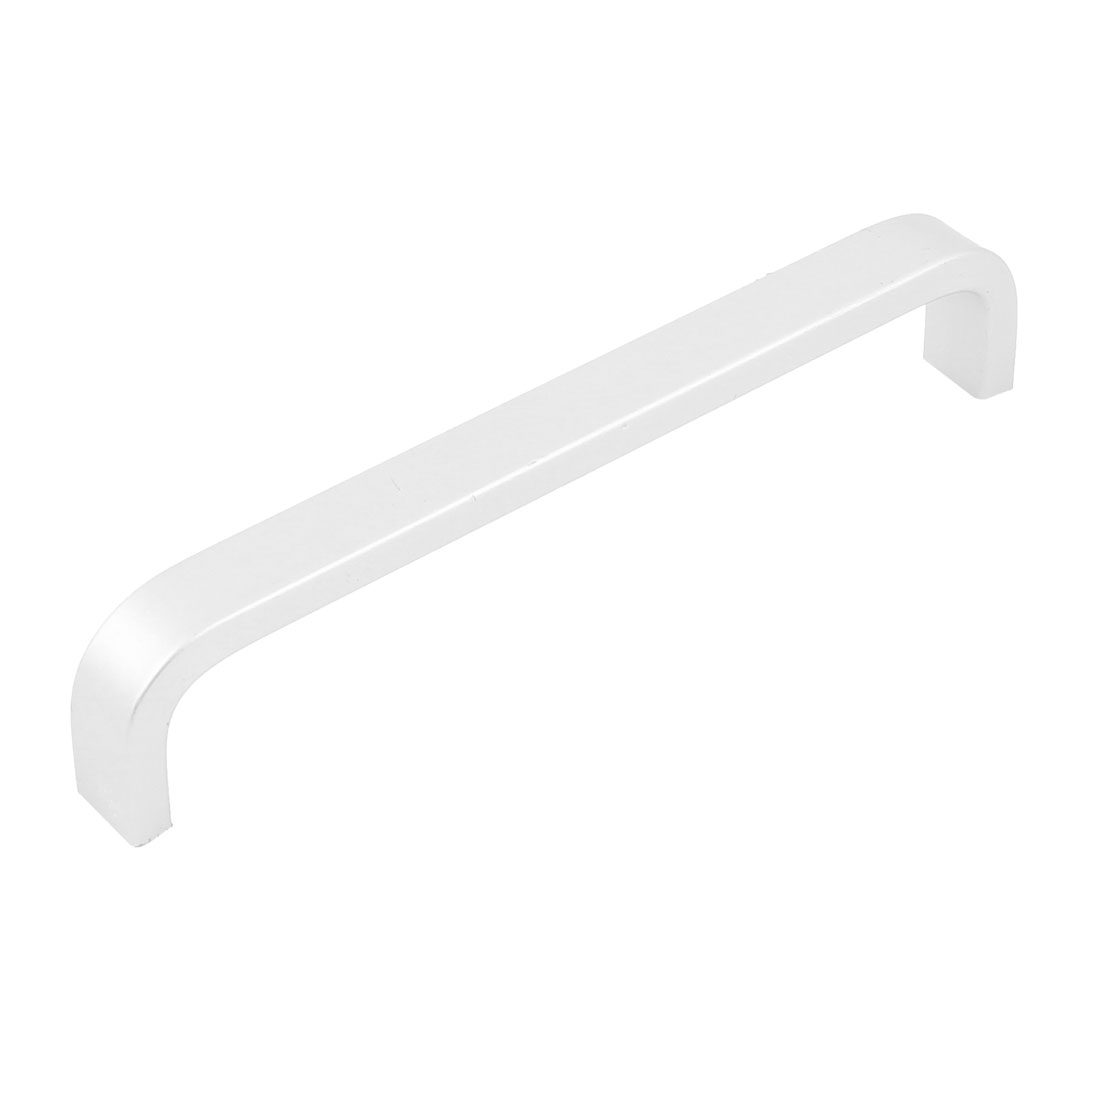 135mm Long Dresser Cabinet Drawer Aluminium Alloy Pull Handle Silver Tone